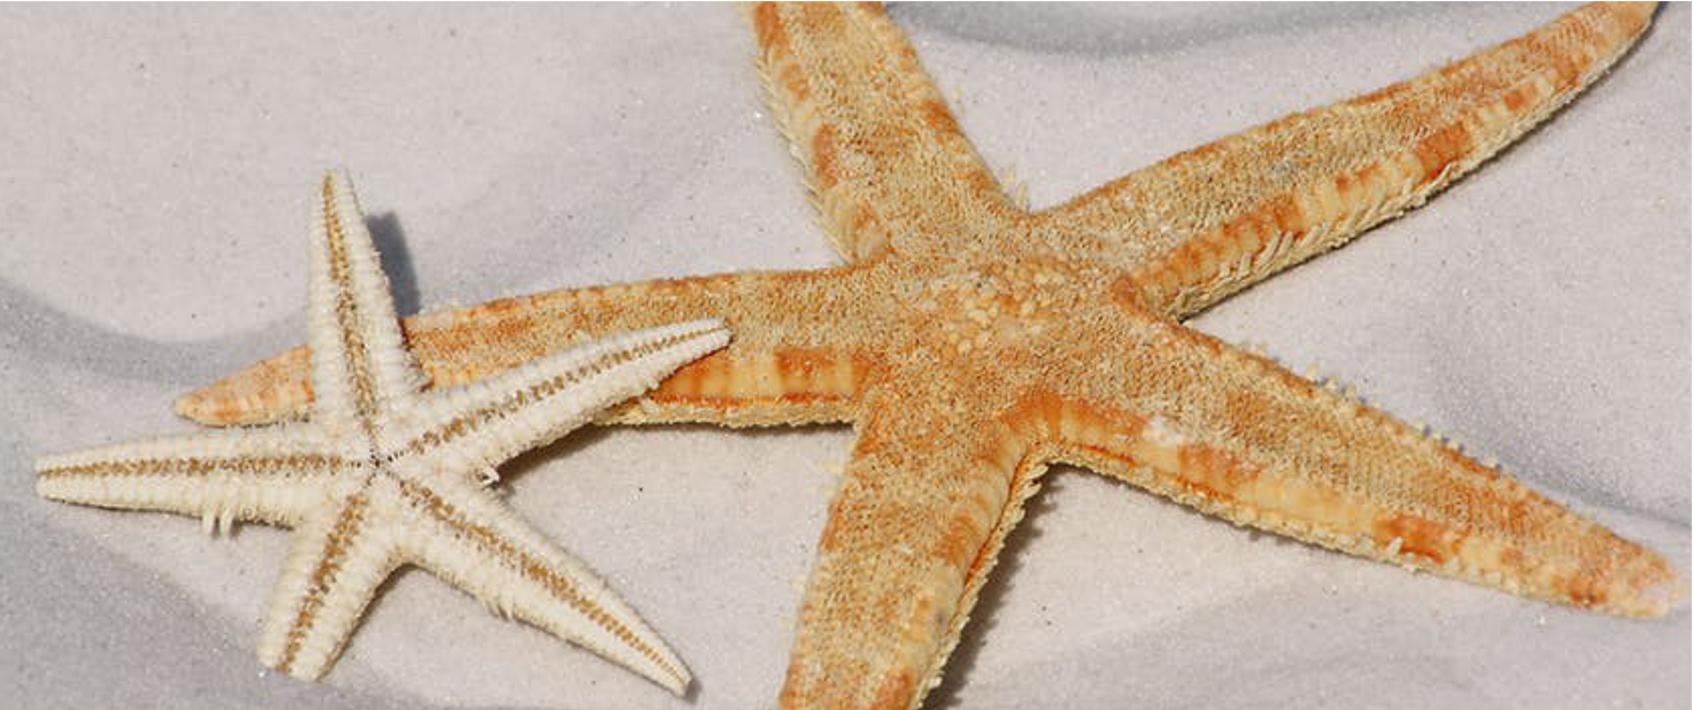 orange and white sea stars